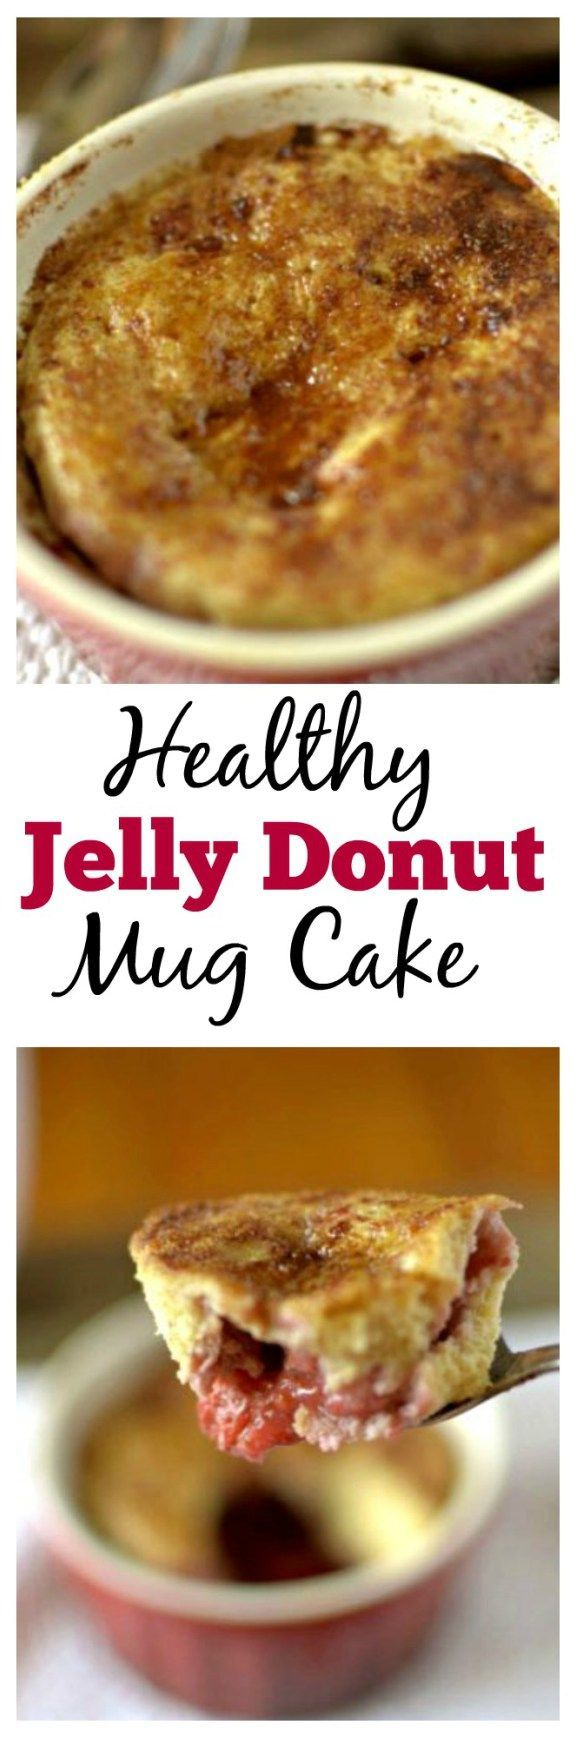 Jelly Donut Mug Cake | Recipe | Paleo mug cake, Mug ...